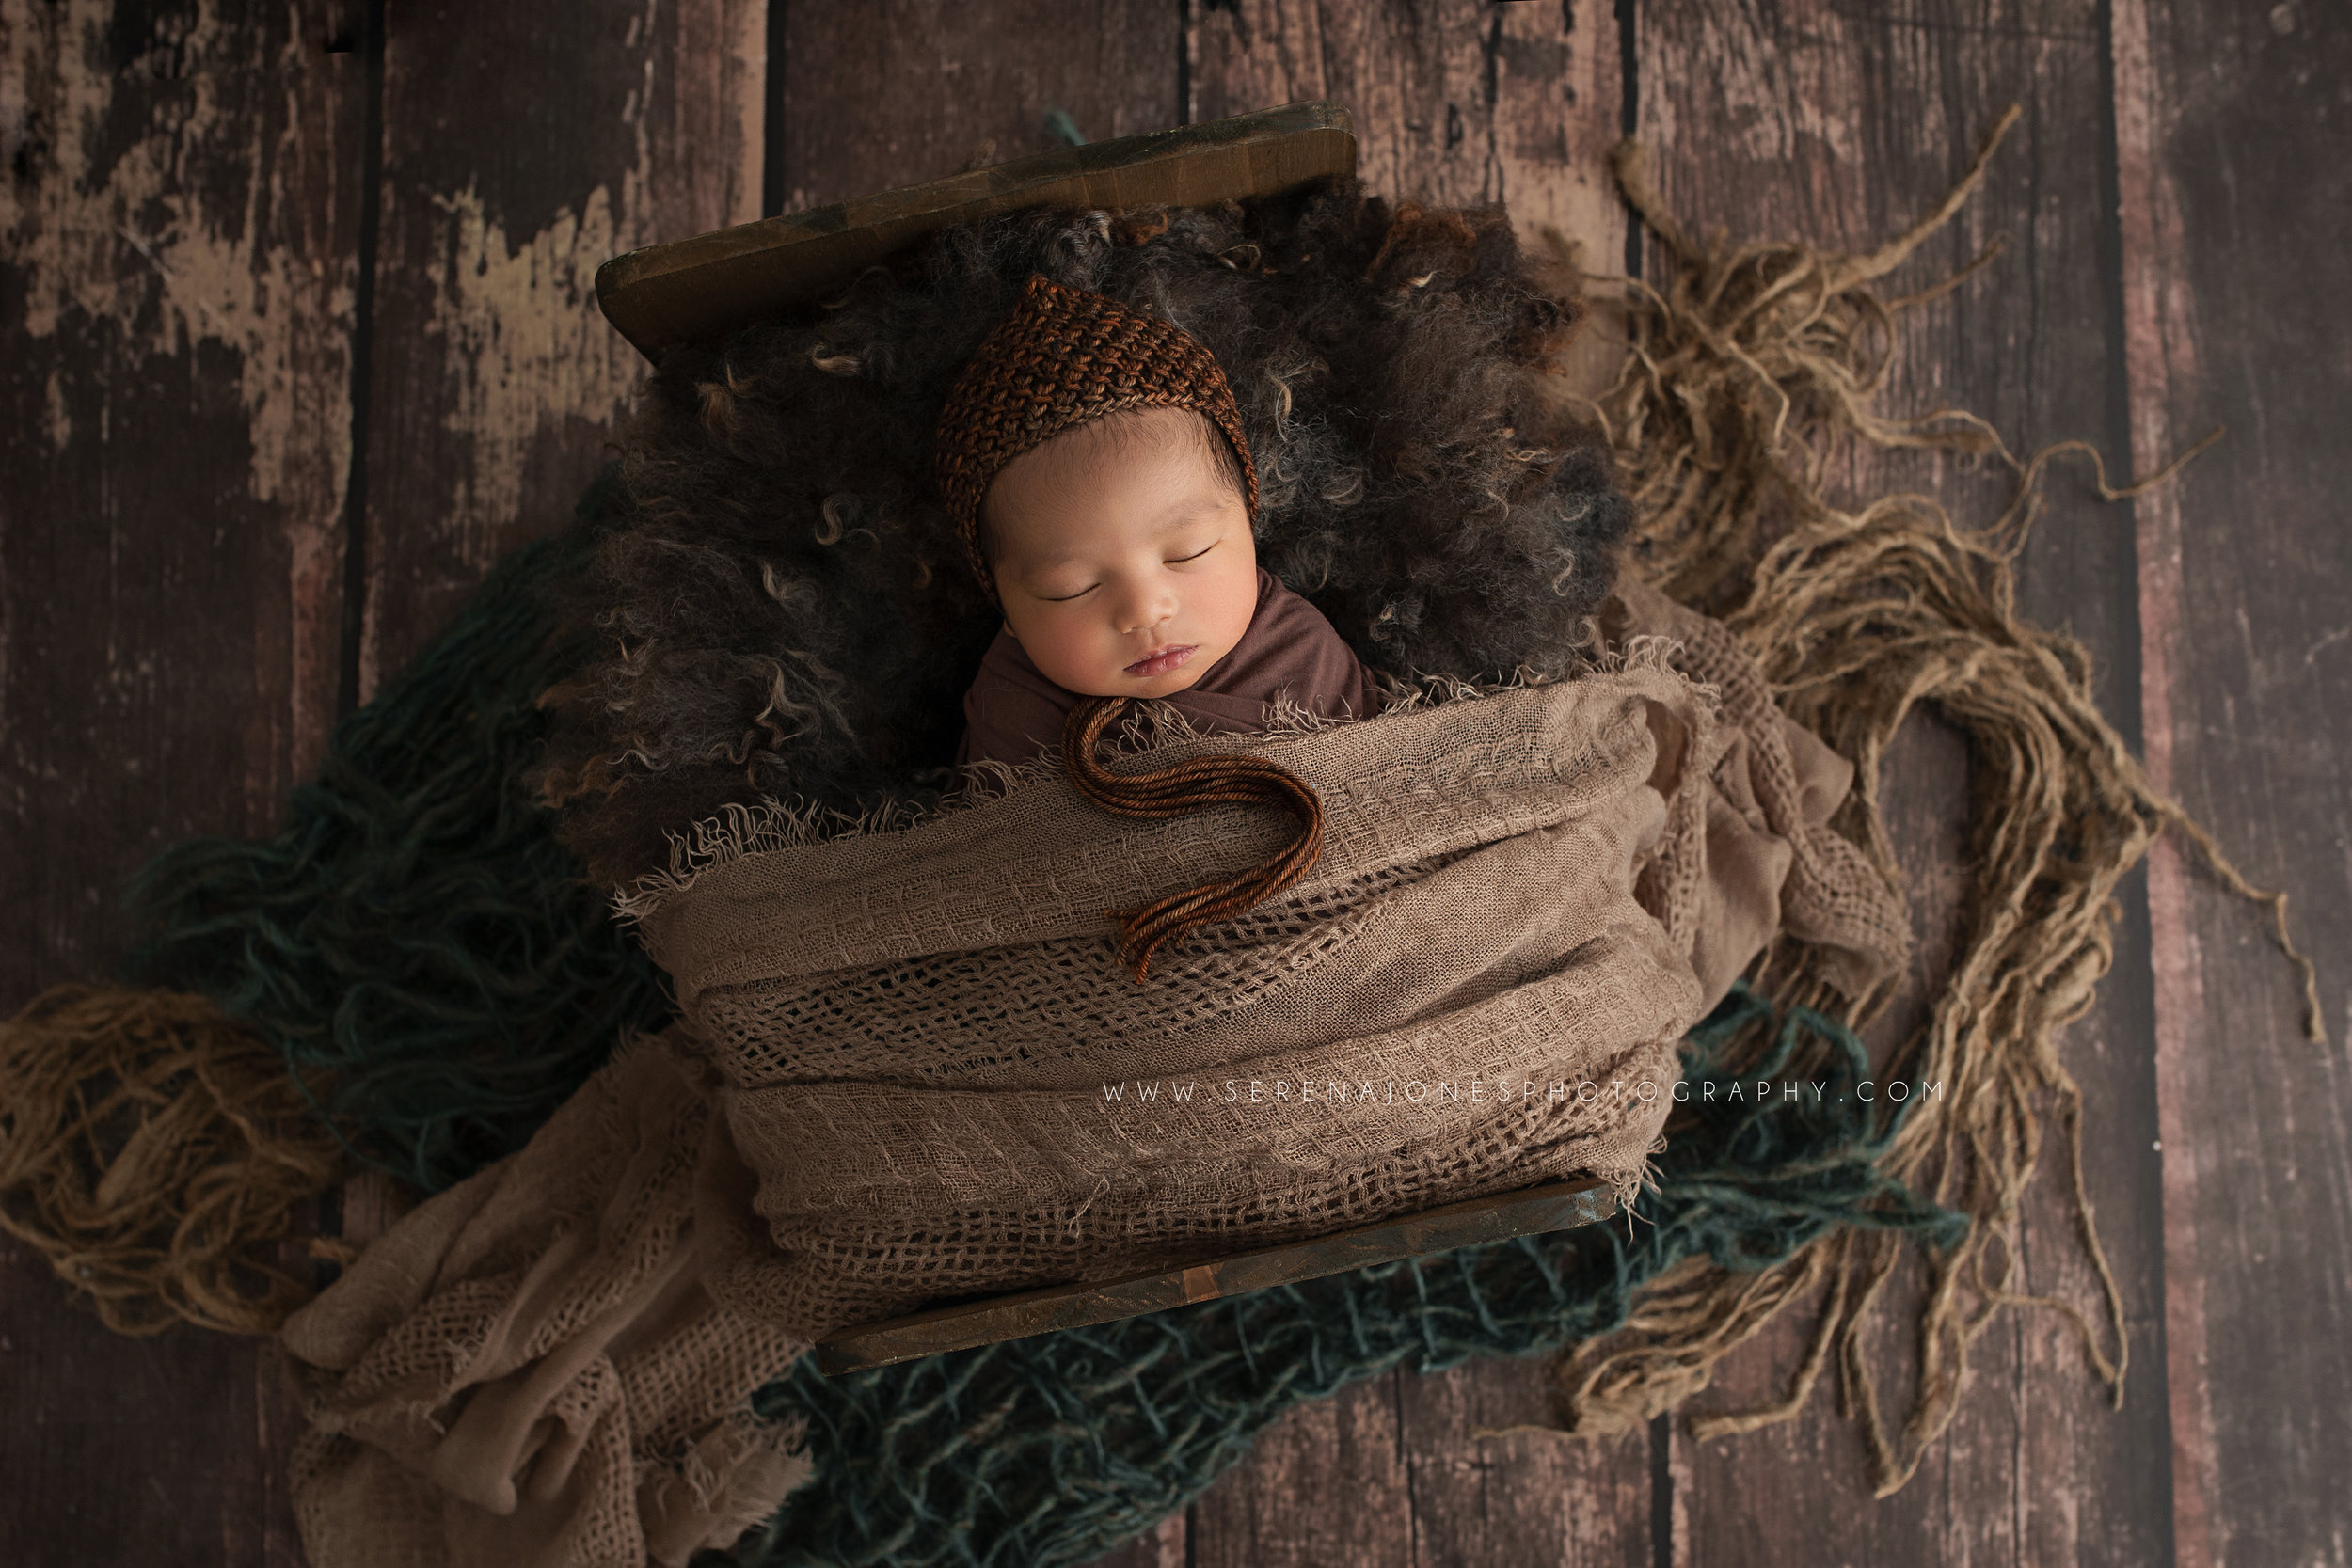 Serena Jones Photography - Tobias Akira Mateo - 14 FB.jpg